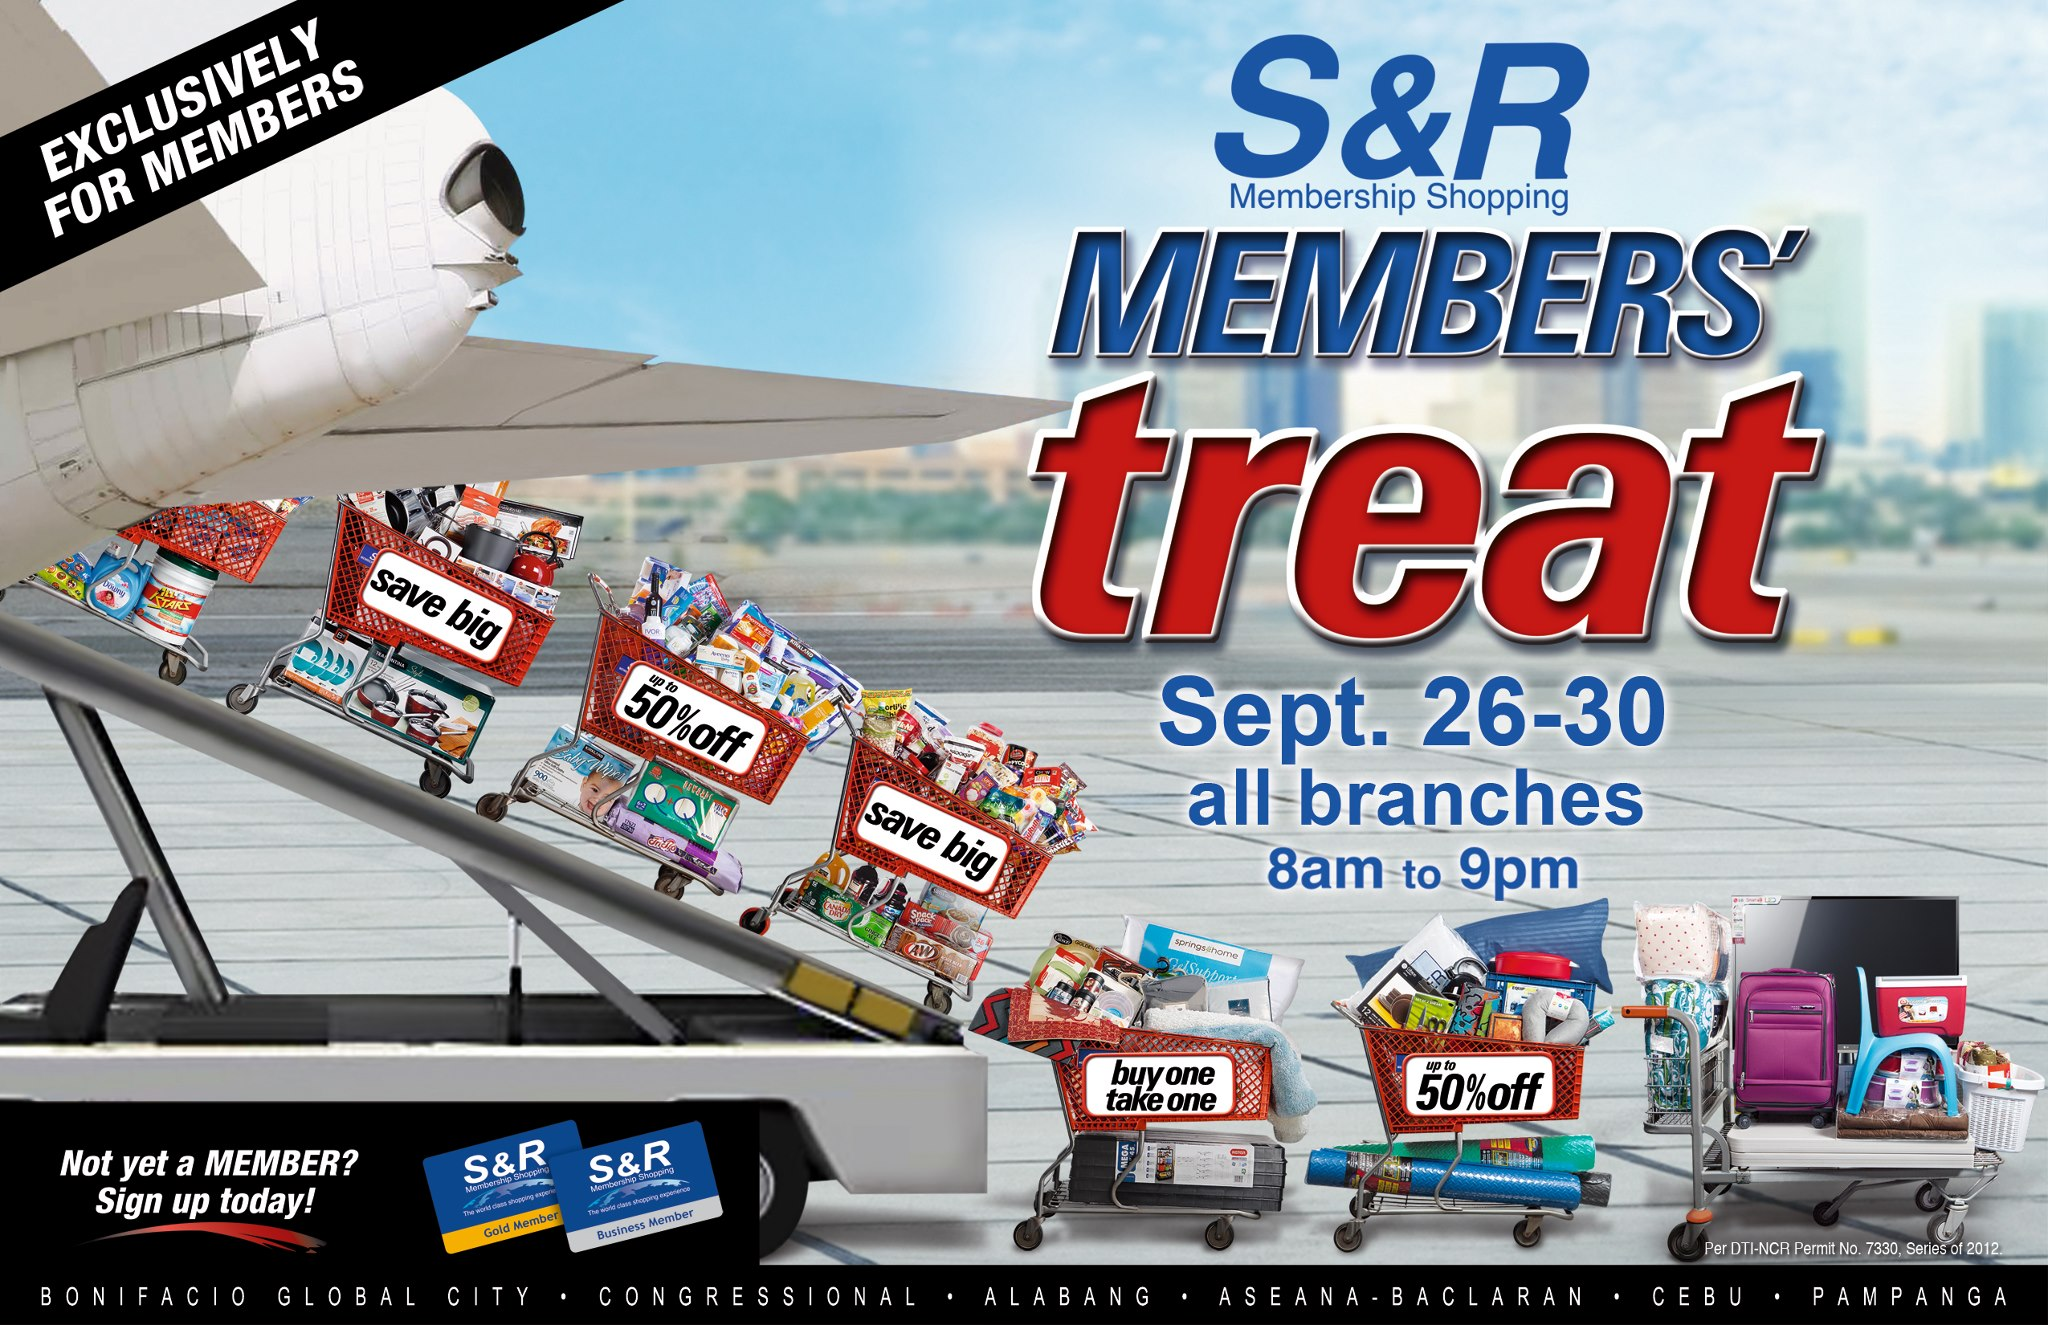 S&R Members' Treat September 2012